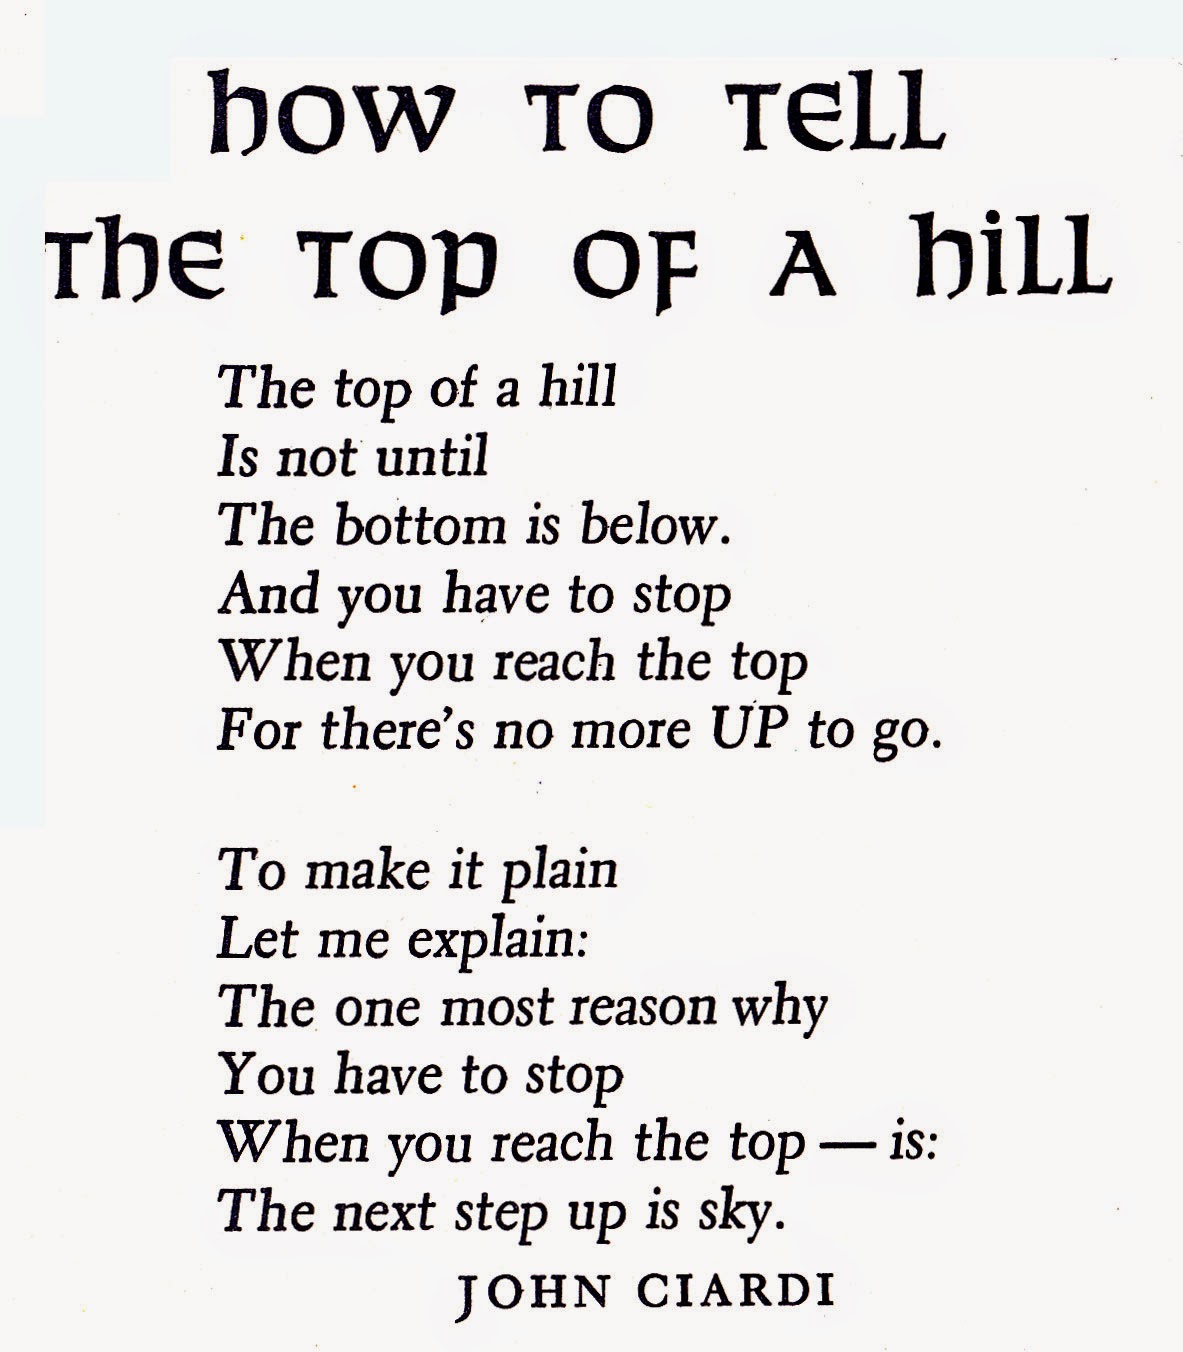 John Ciardi poem